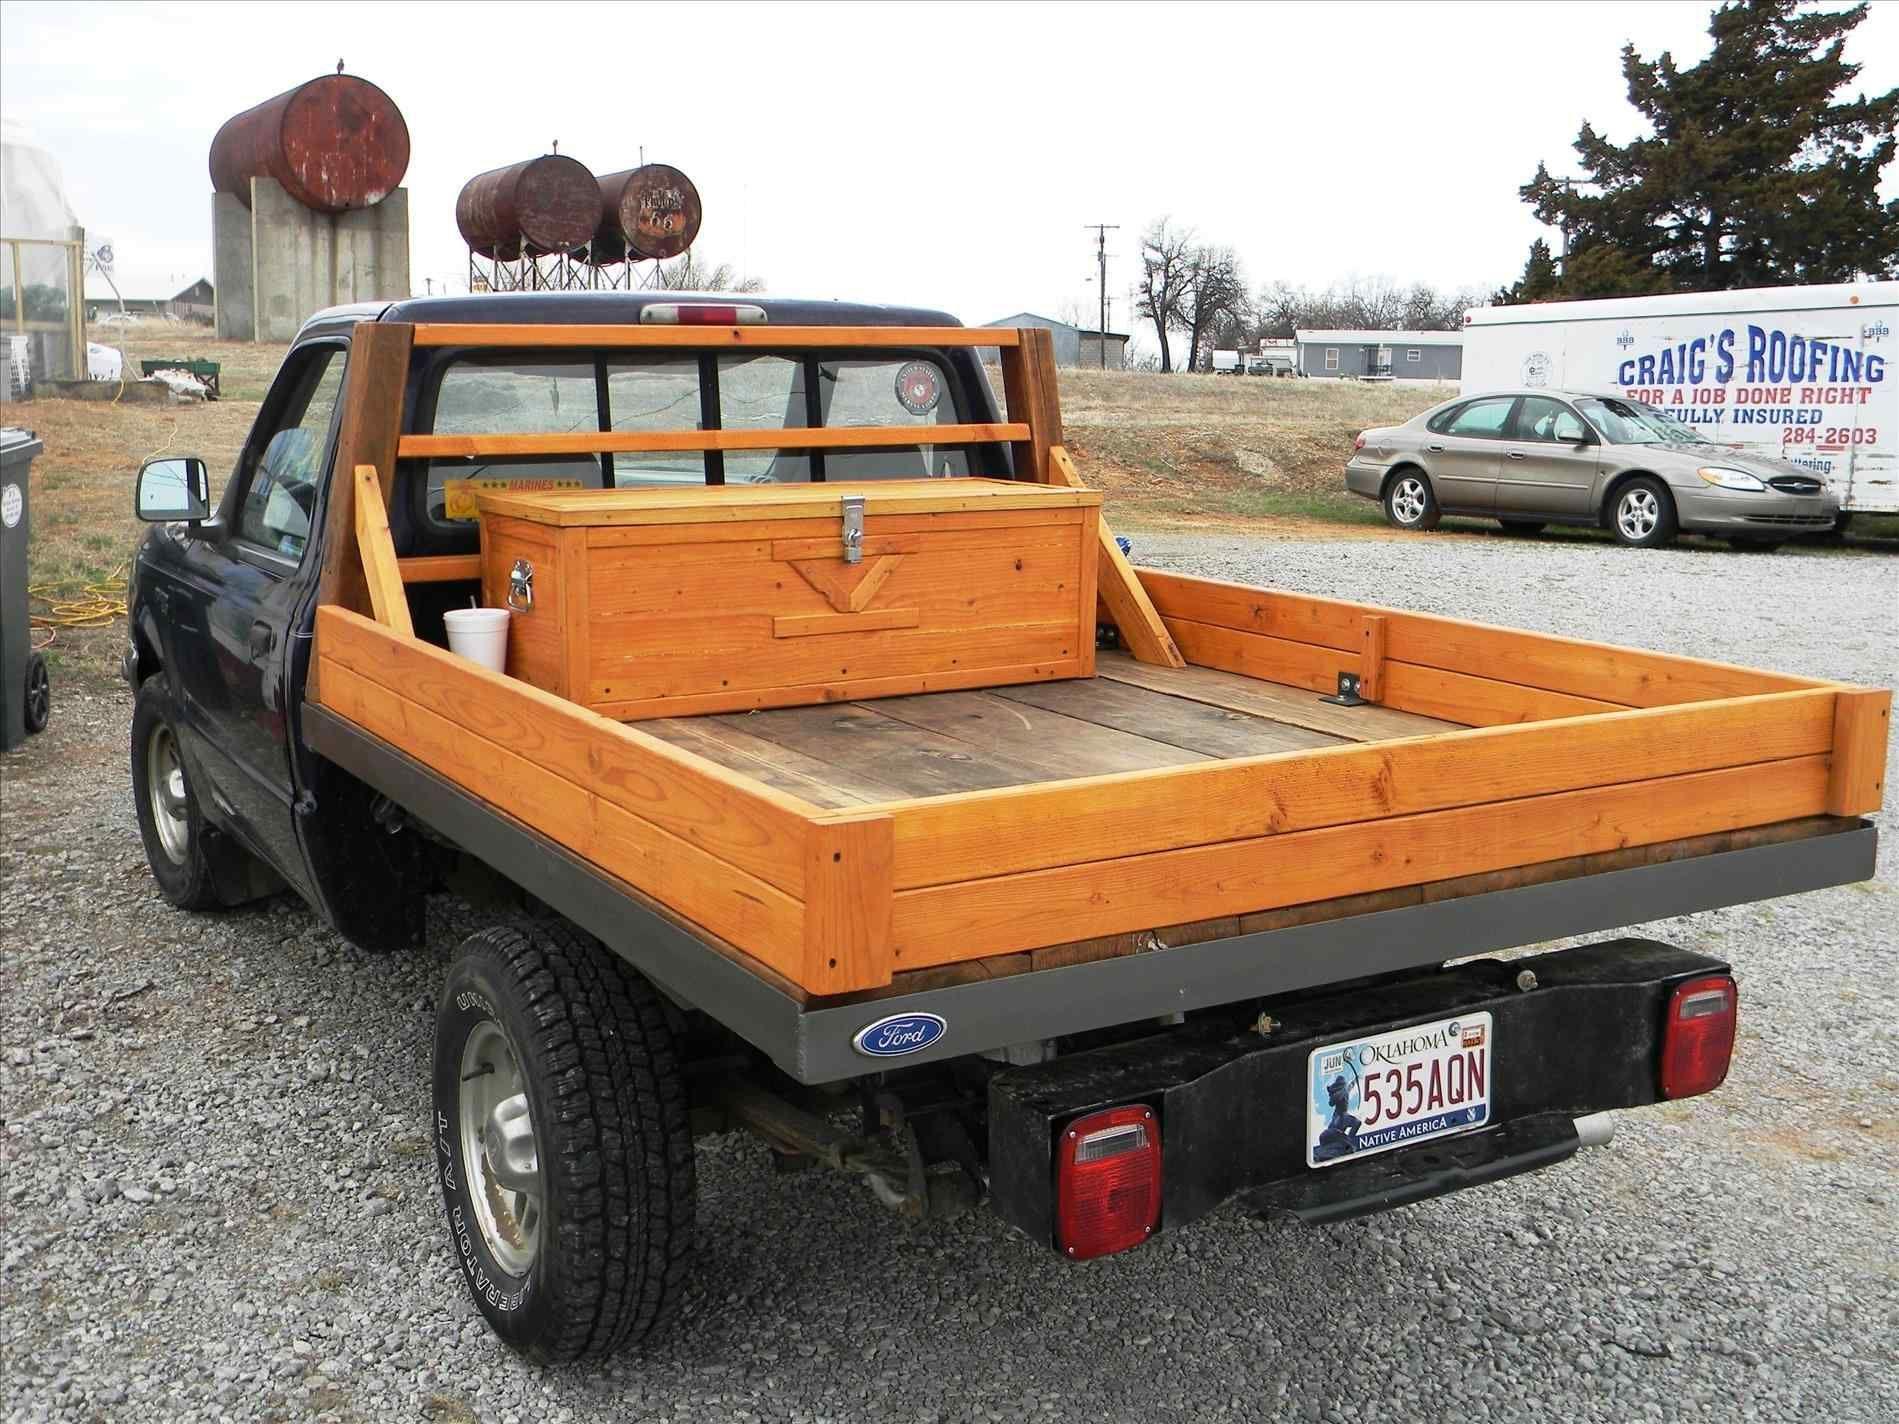 Pin by David Batzer on Truck Stuff Wooden truck bedding